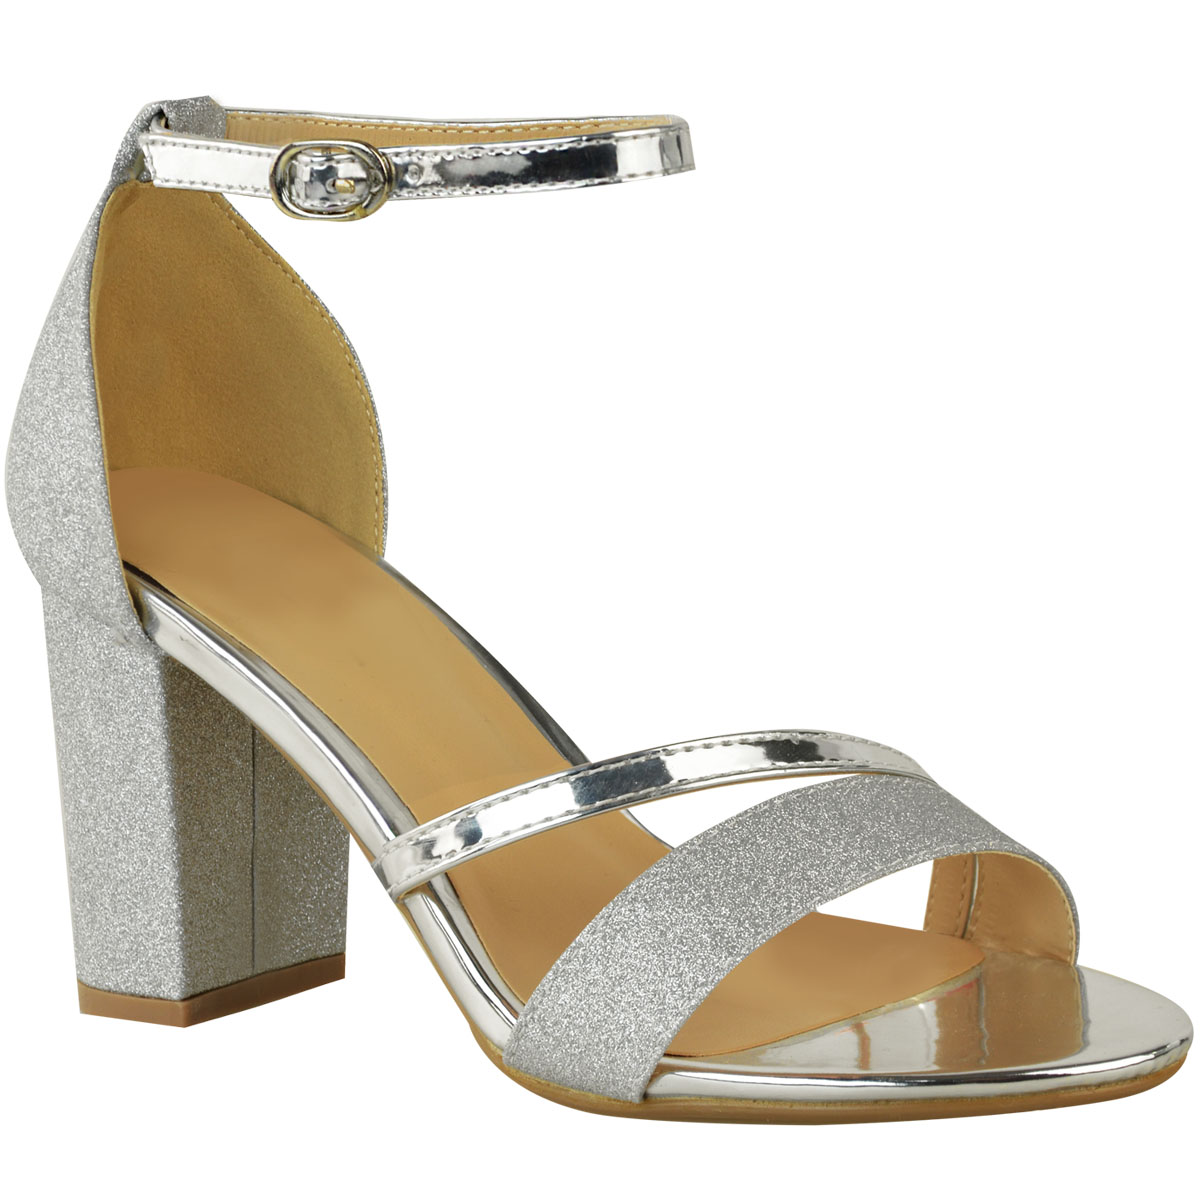 534550760cab Womens Sparkle Diamante Low Mid Heel Sandals Wedding Bridal Prom ...